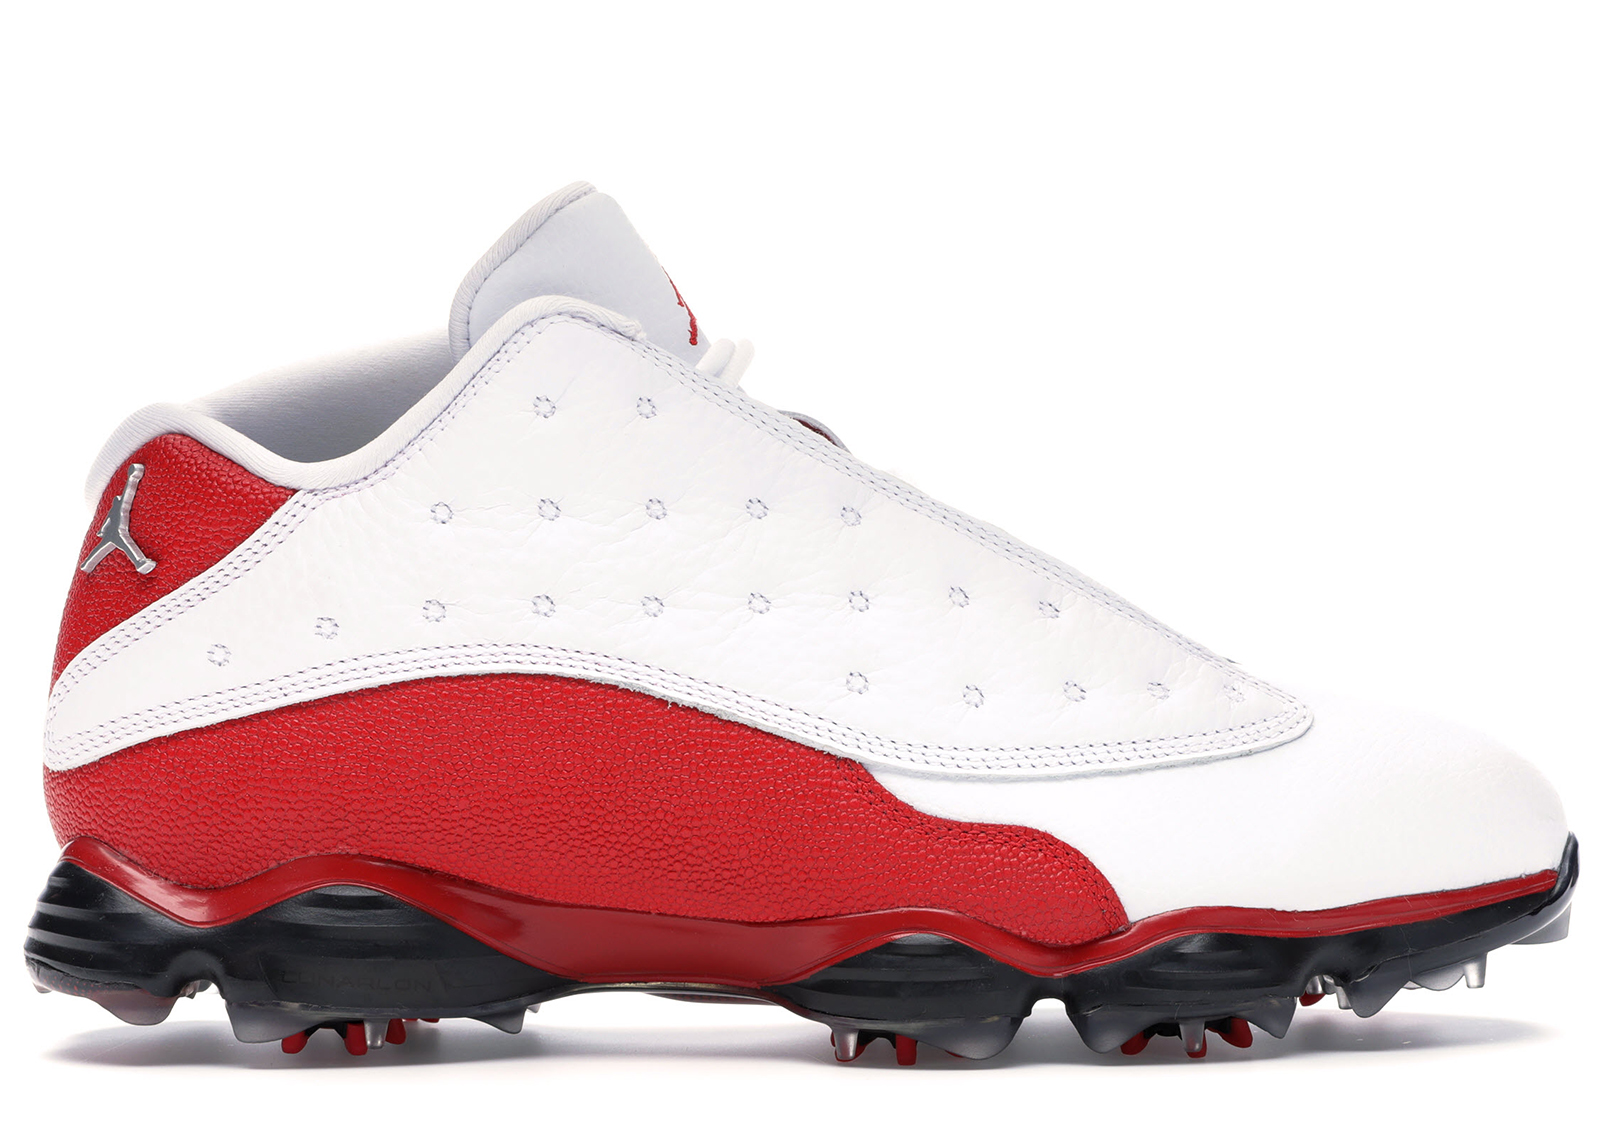 Jordan 13 Retro Golf Cleat White Red